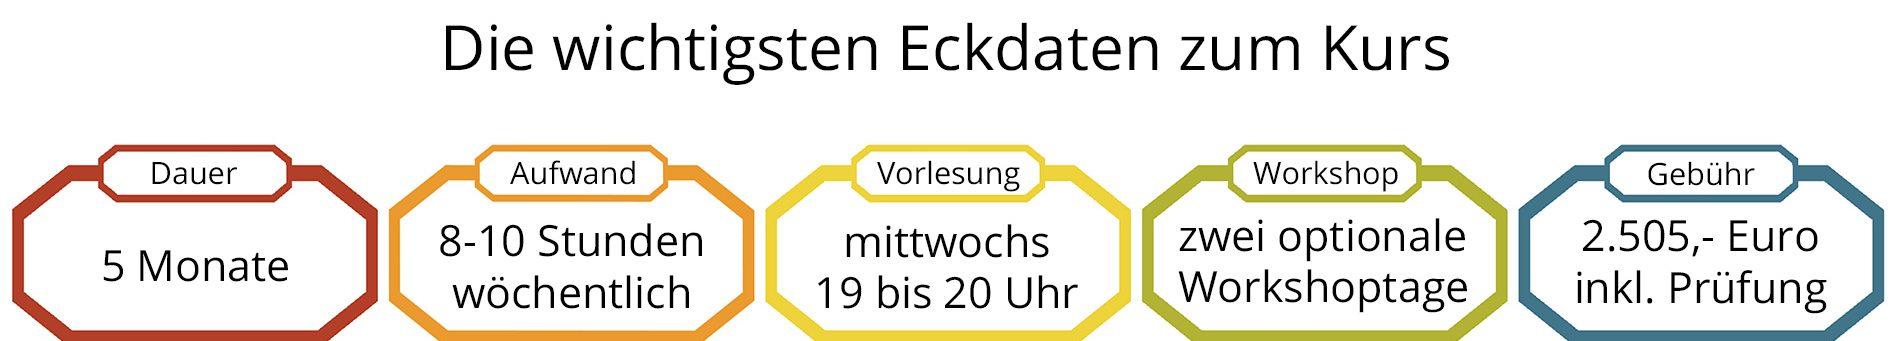 Webdesigner_Kurs_Ausbildung_Webseiten_Design_Agentur_03